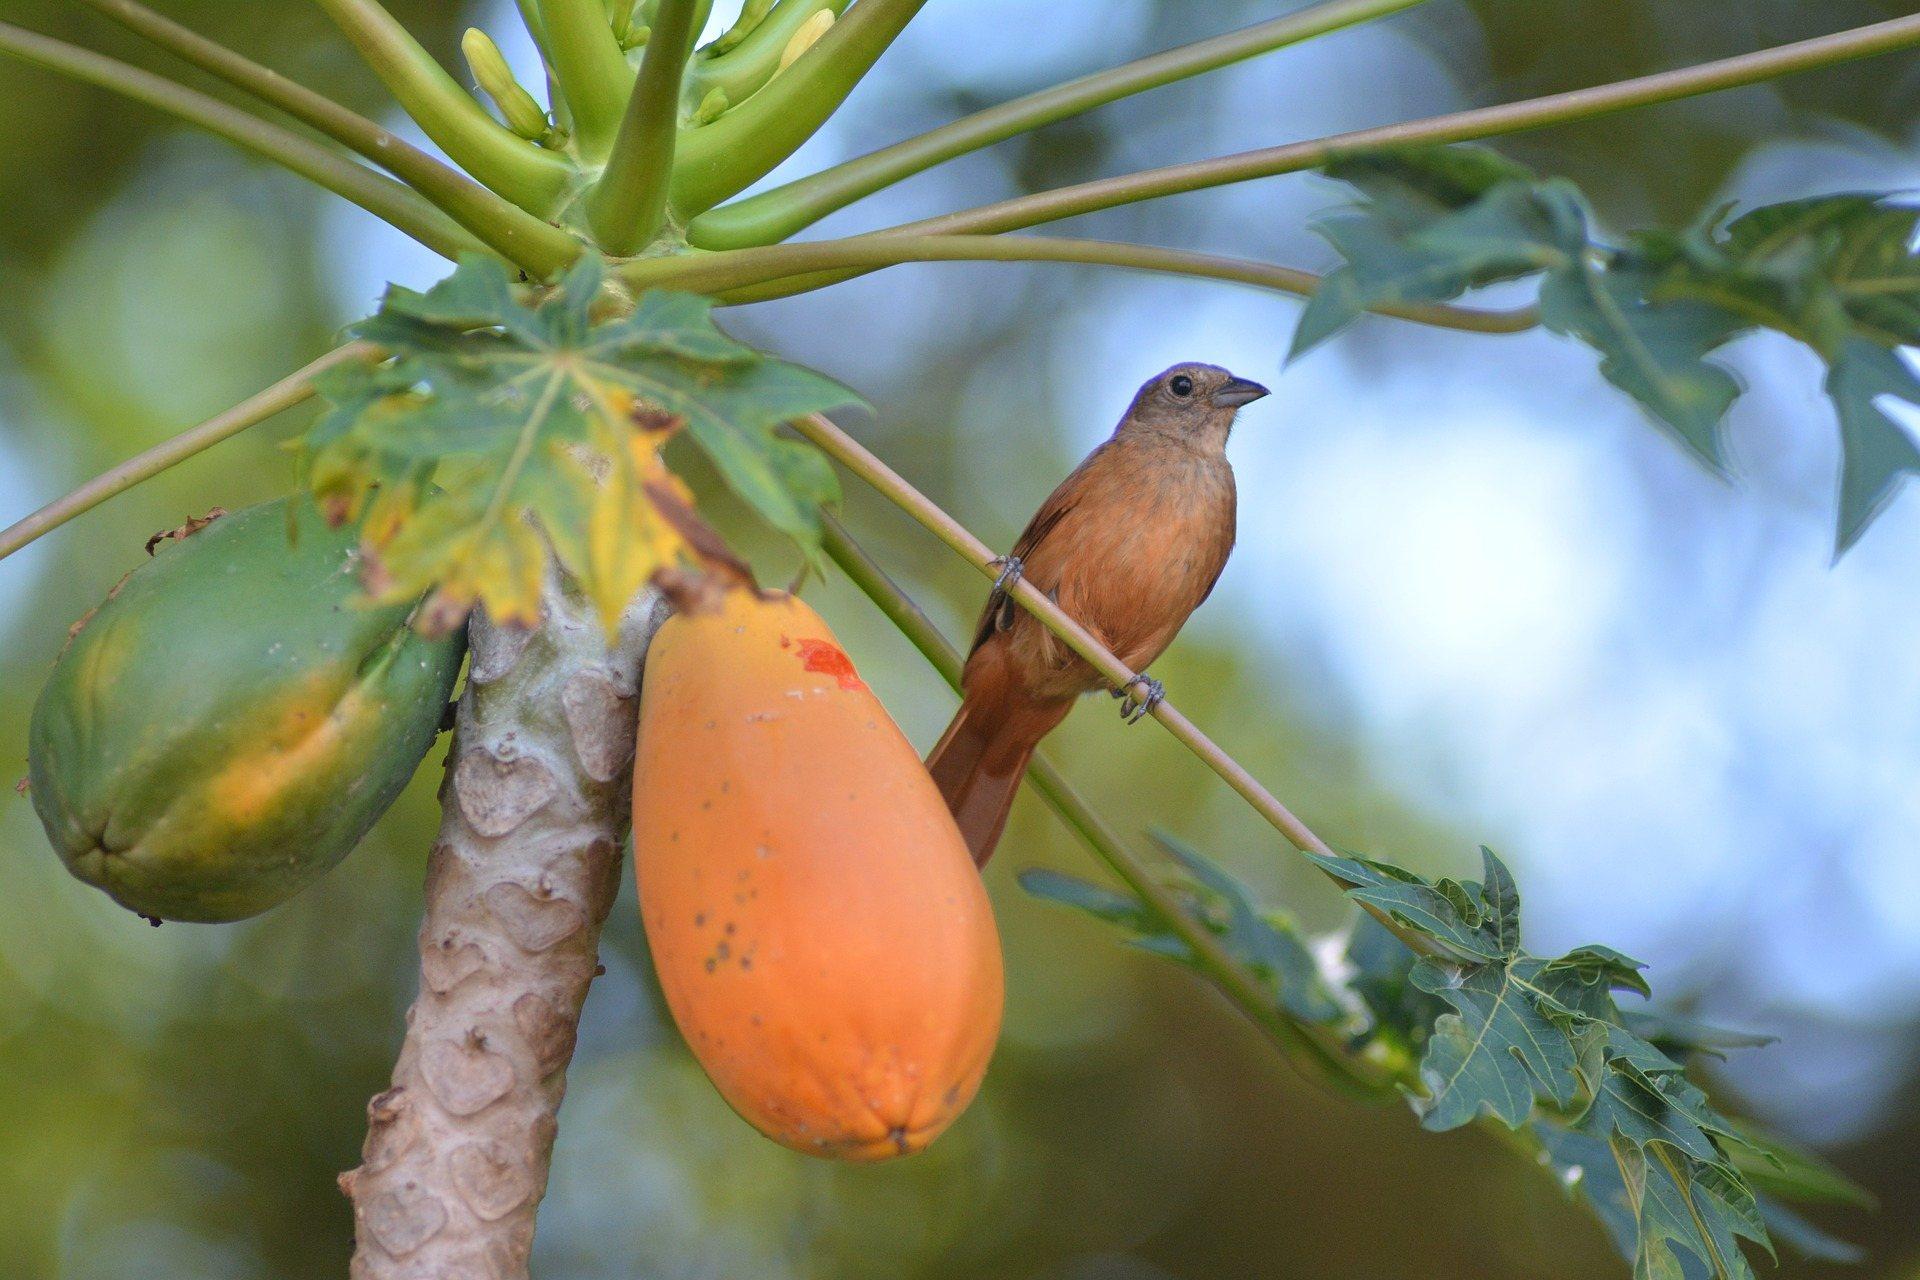 How Ripe Should Papaya Be